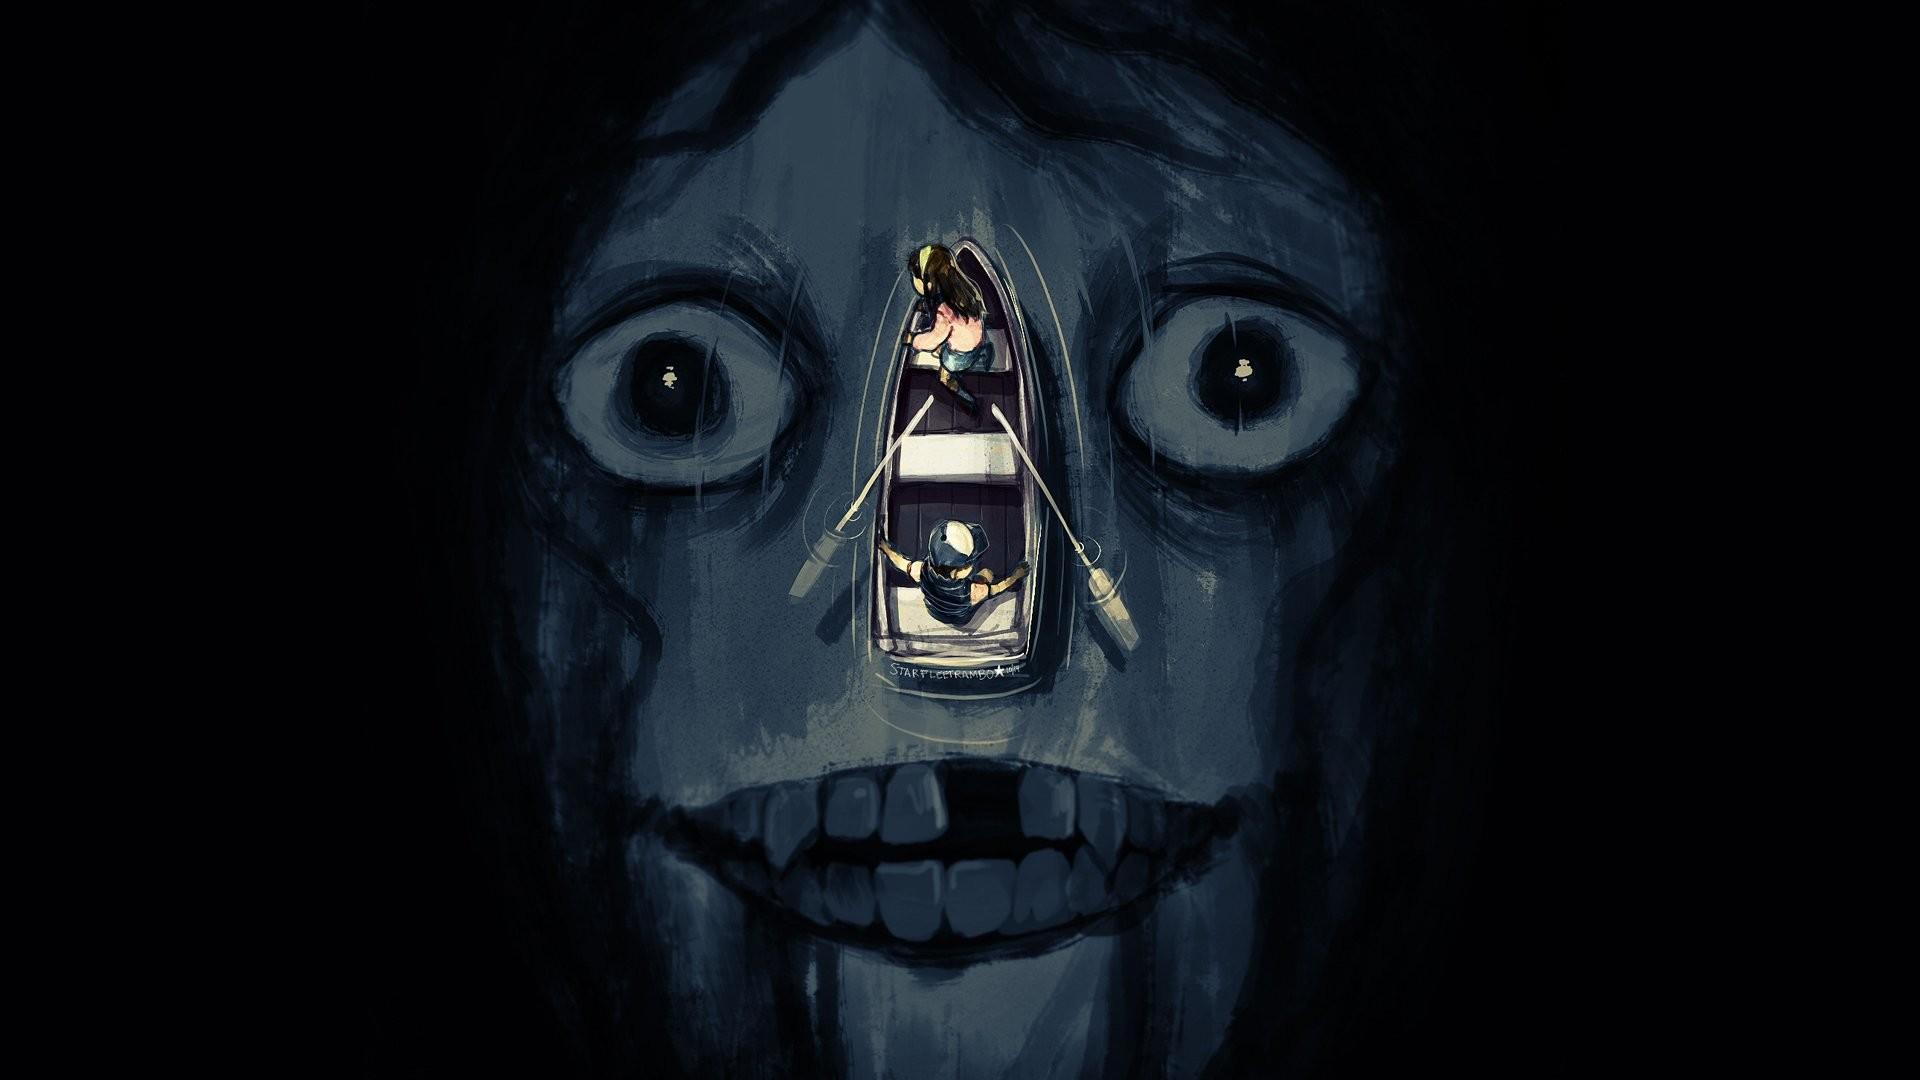 Res: 1920x1080, DARK evil horror spooky creepy scary wallpaper |  | 804796 |  WallpaperUP